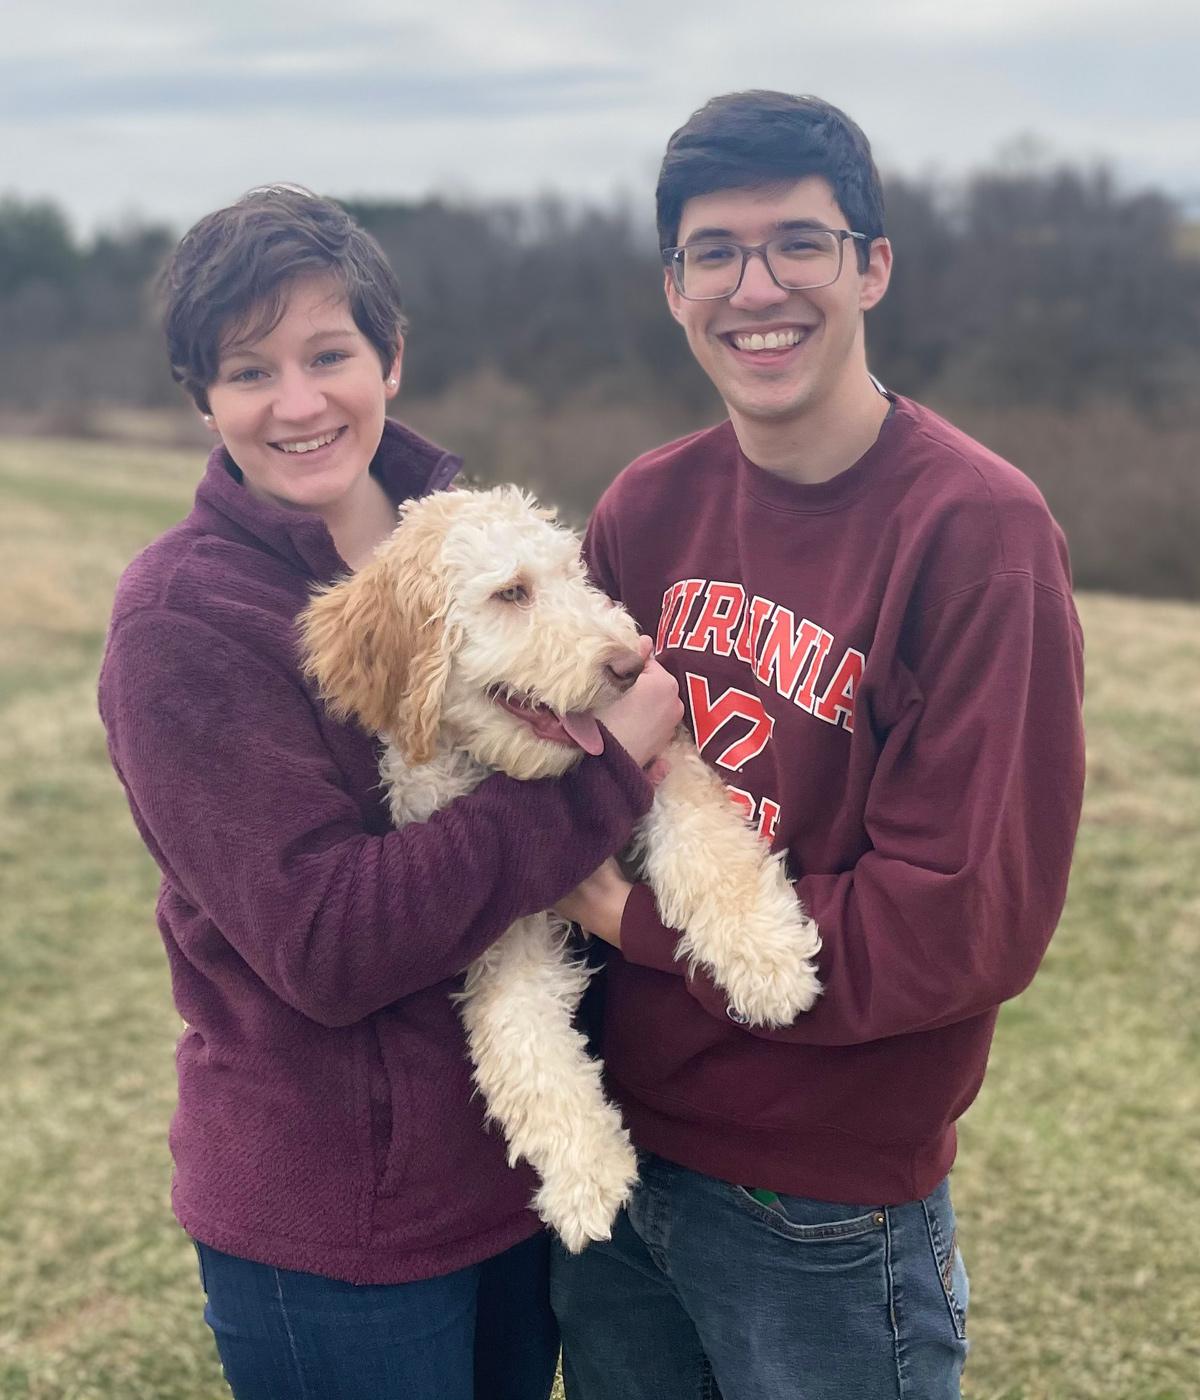 Ian and Catherine Jelliffe holding their dog Watson